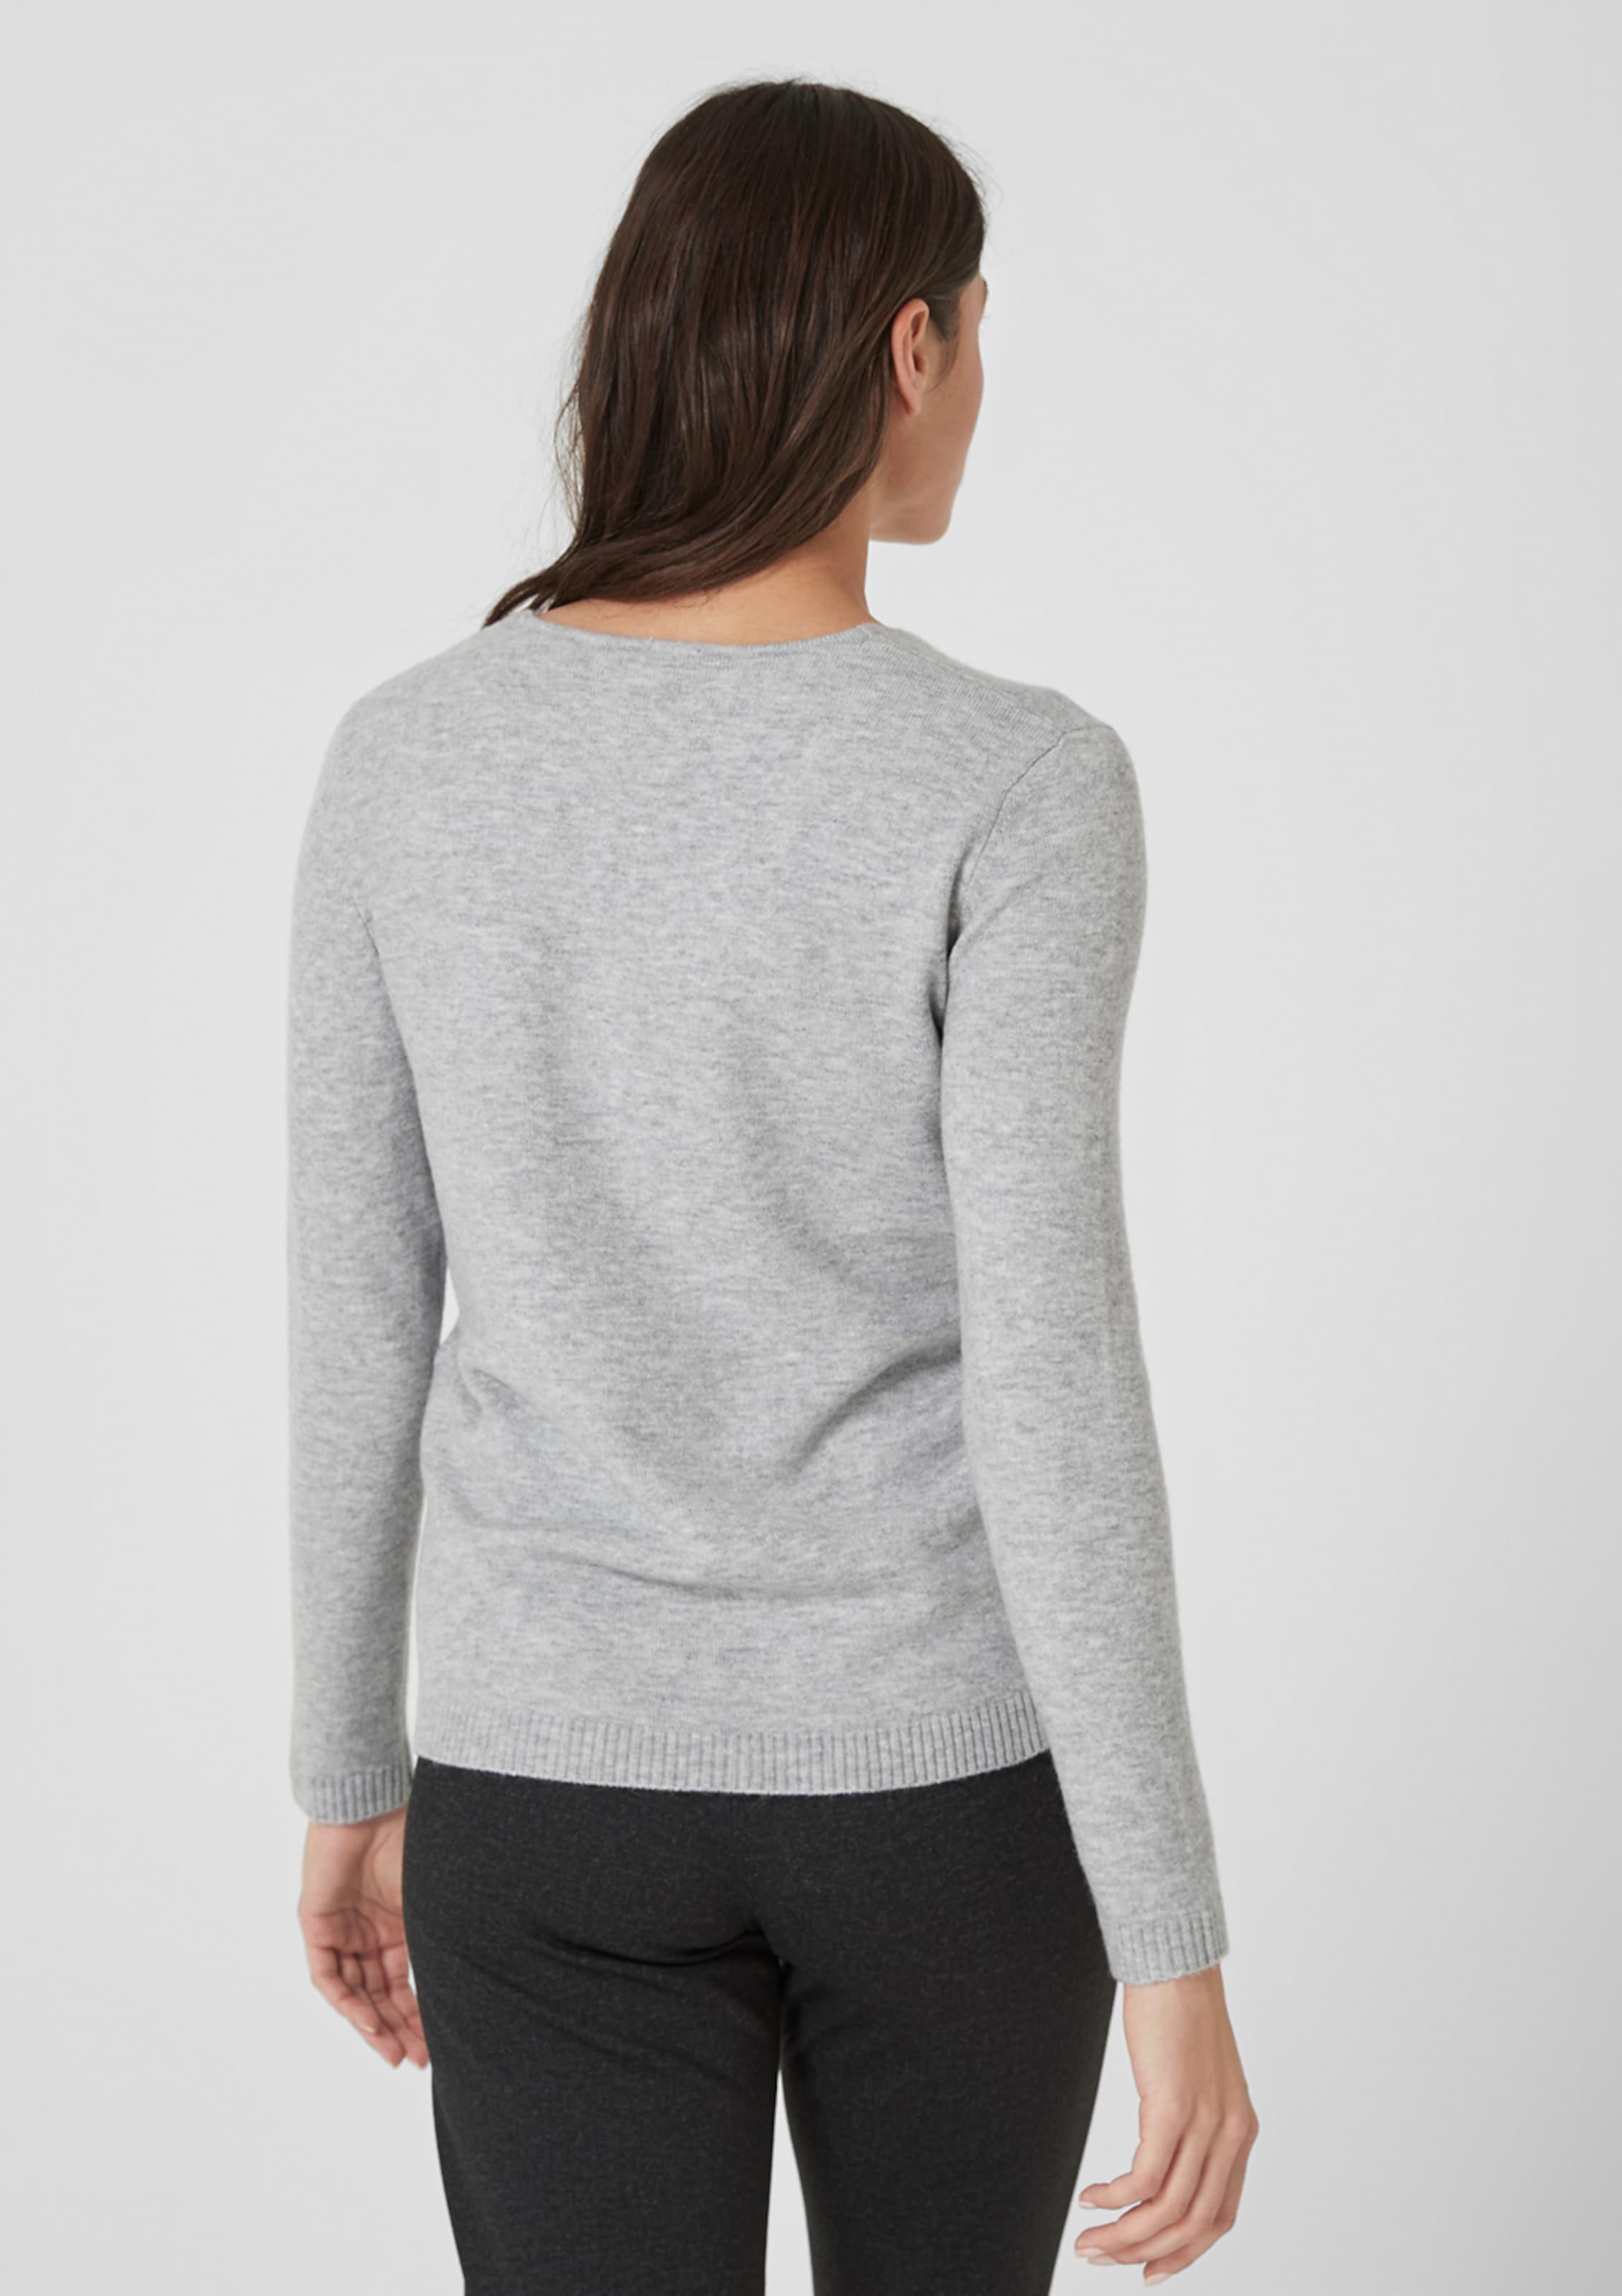 professional sale performance sportswear 50% price S Black oliver Feinstrickpullover In Label Graumeliert nwO8k0PX